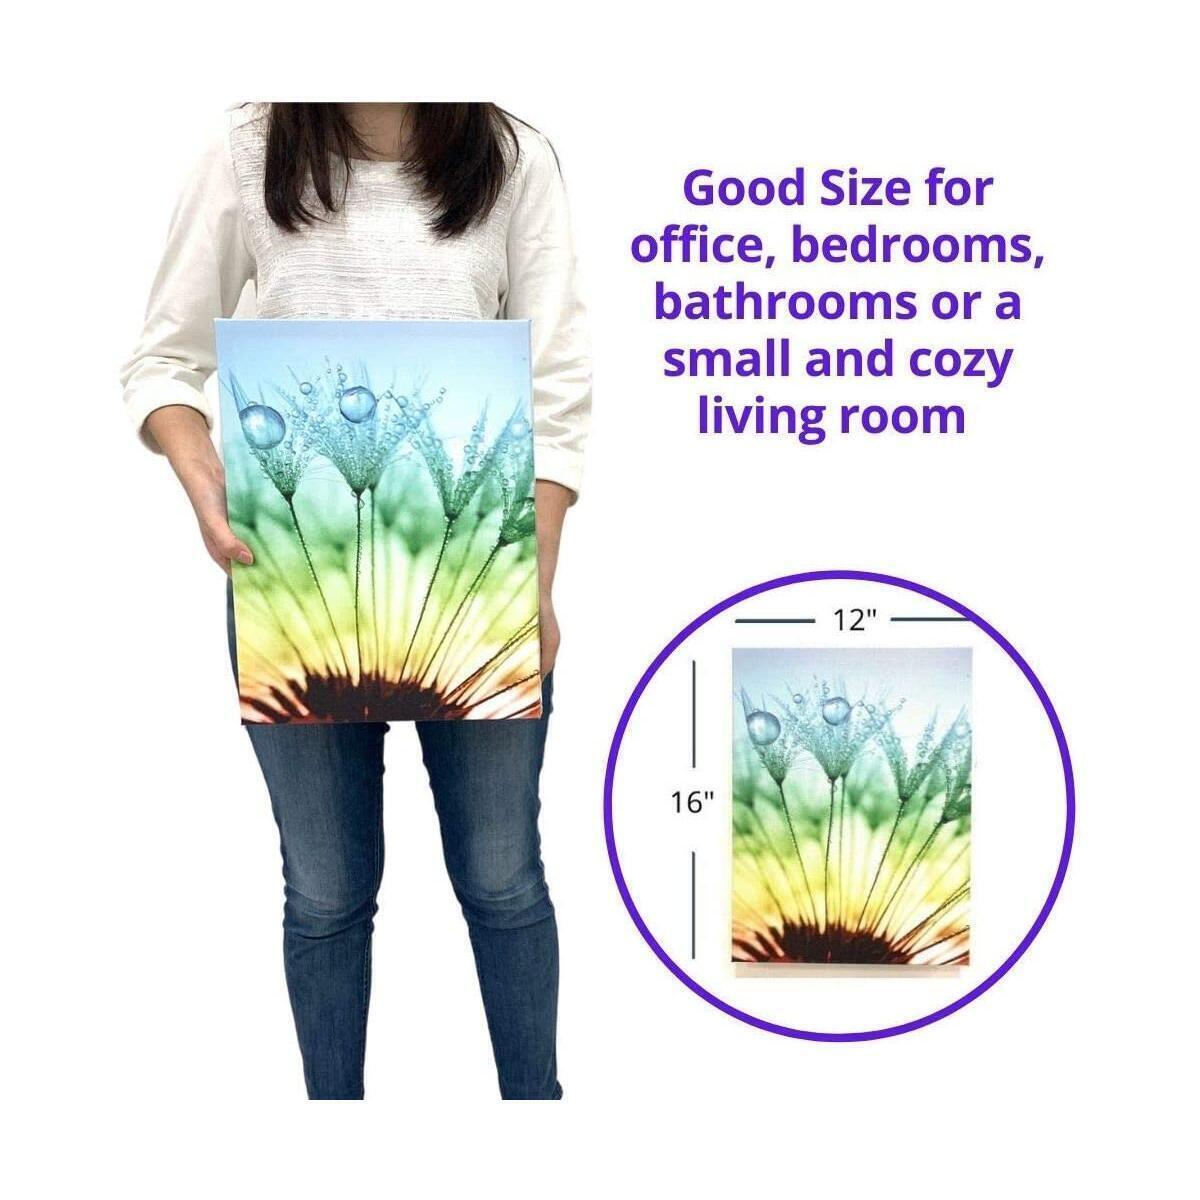 Canvas Wall Art - Bathroom Wall Art, Beautiful Dandelion Art Work Framed Wall Art, Wall Decor for Home, Bedroom, Kitchen, Office, Hallway Decor, Flower Canvas Wall Art, Cuadros Para Cocina Y Comedor